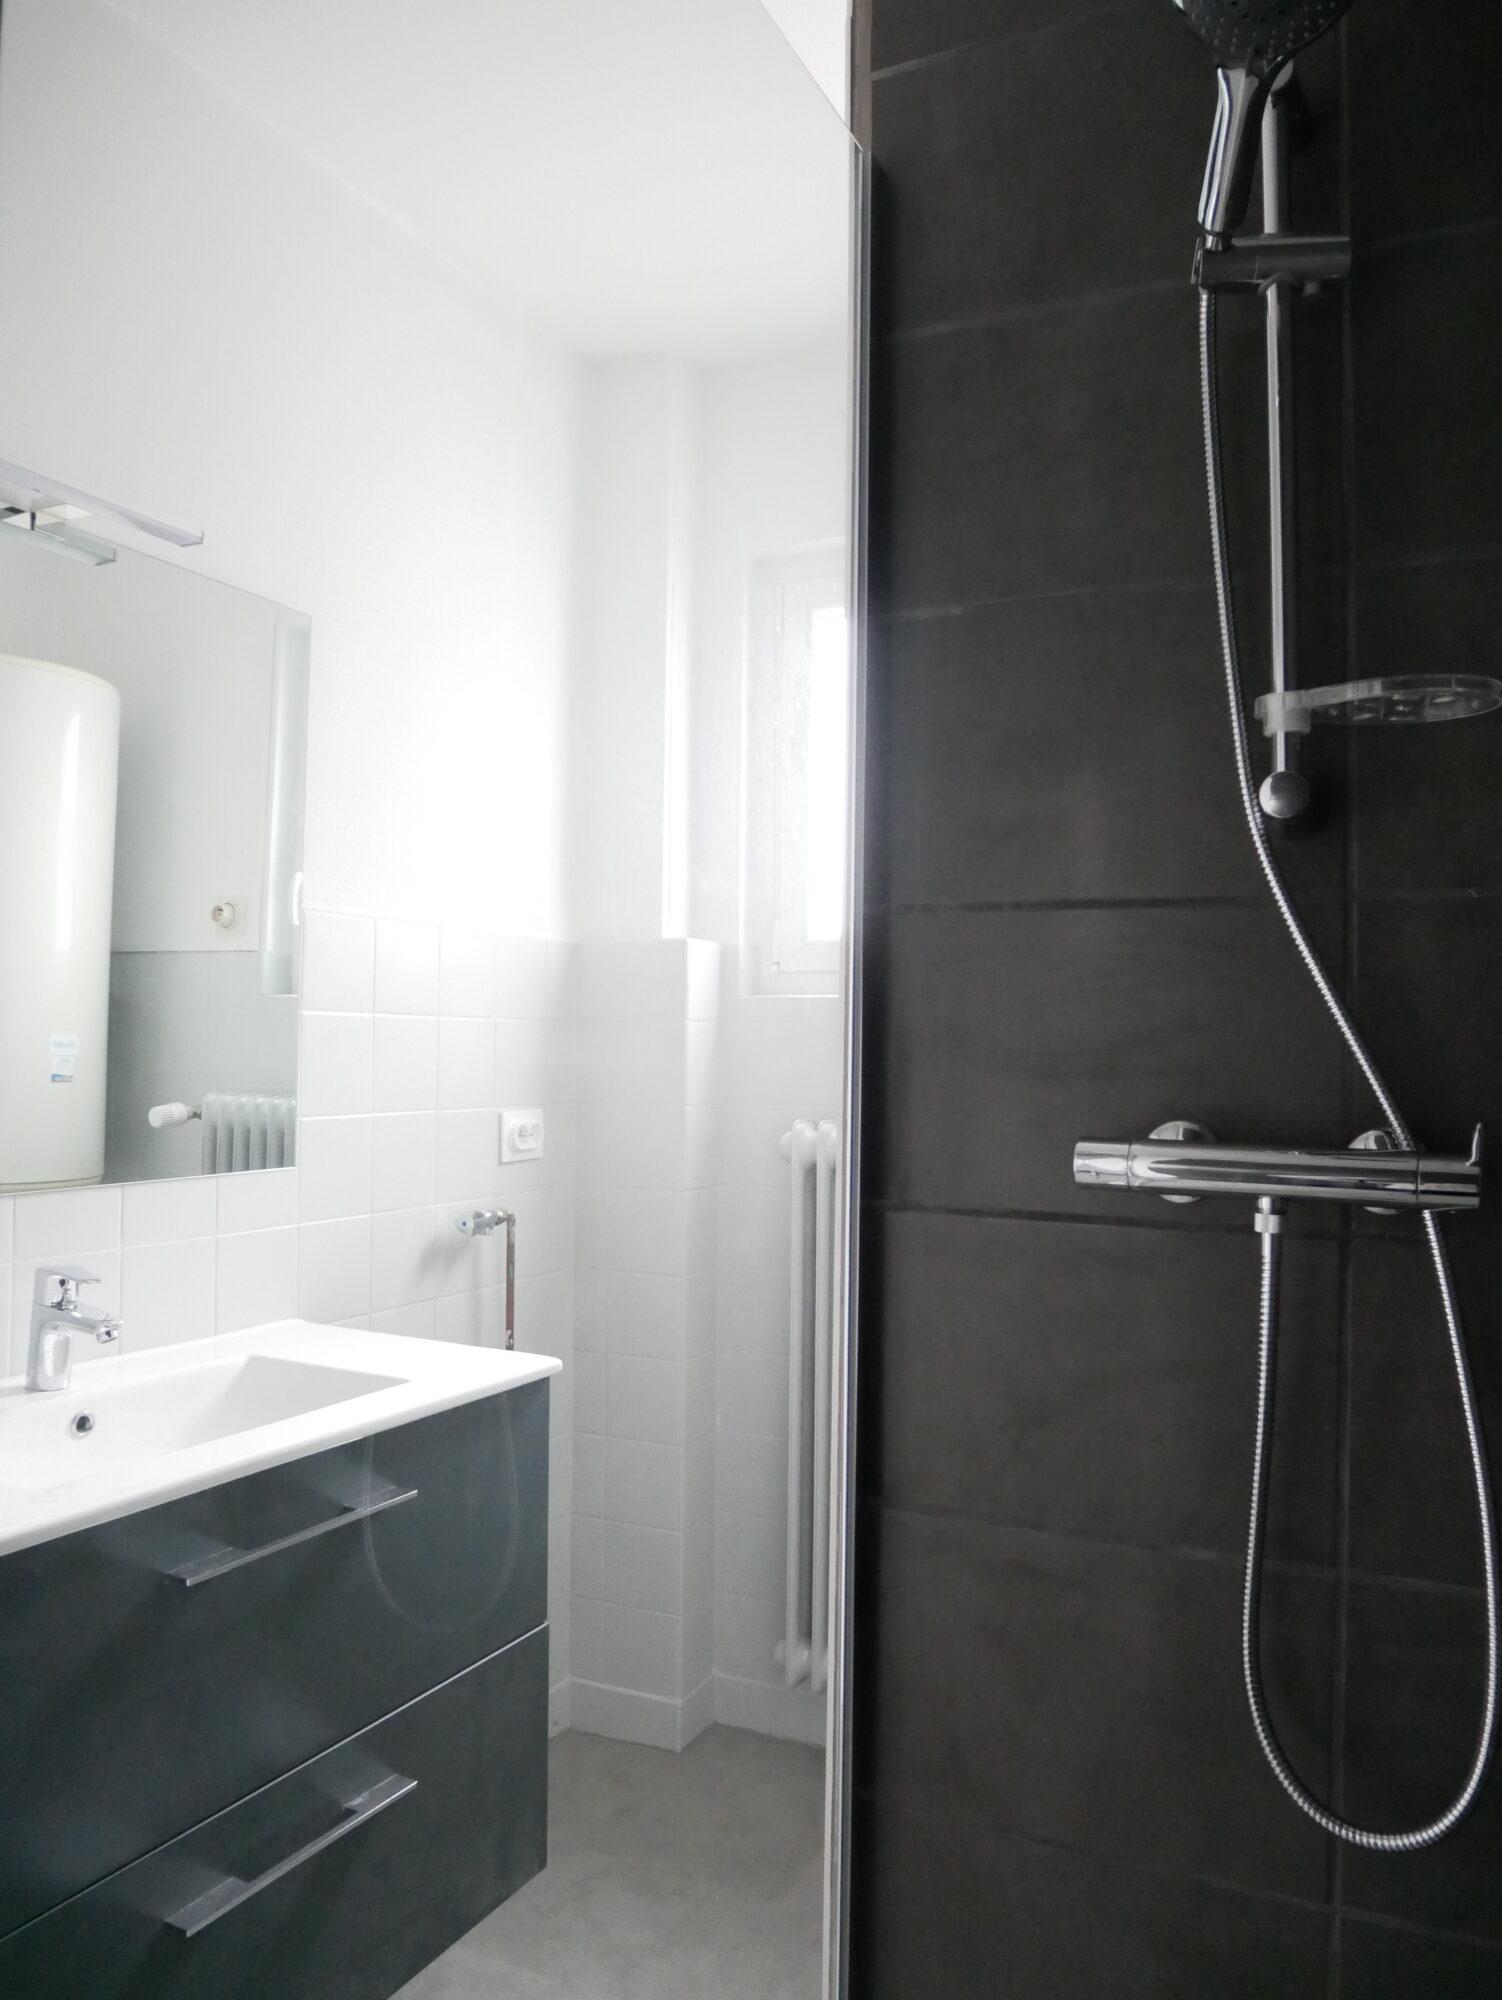 Lumineux appartement 3 pièces avec balcon - Strasbourg / Neudorf - nos ventes - Beausite Immobilier 8